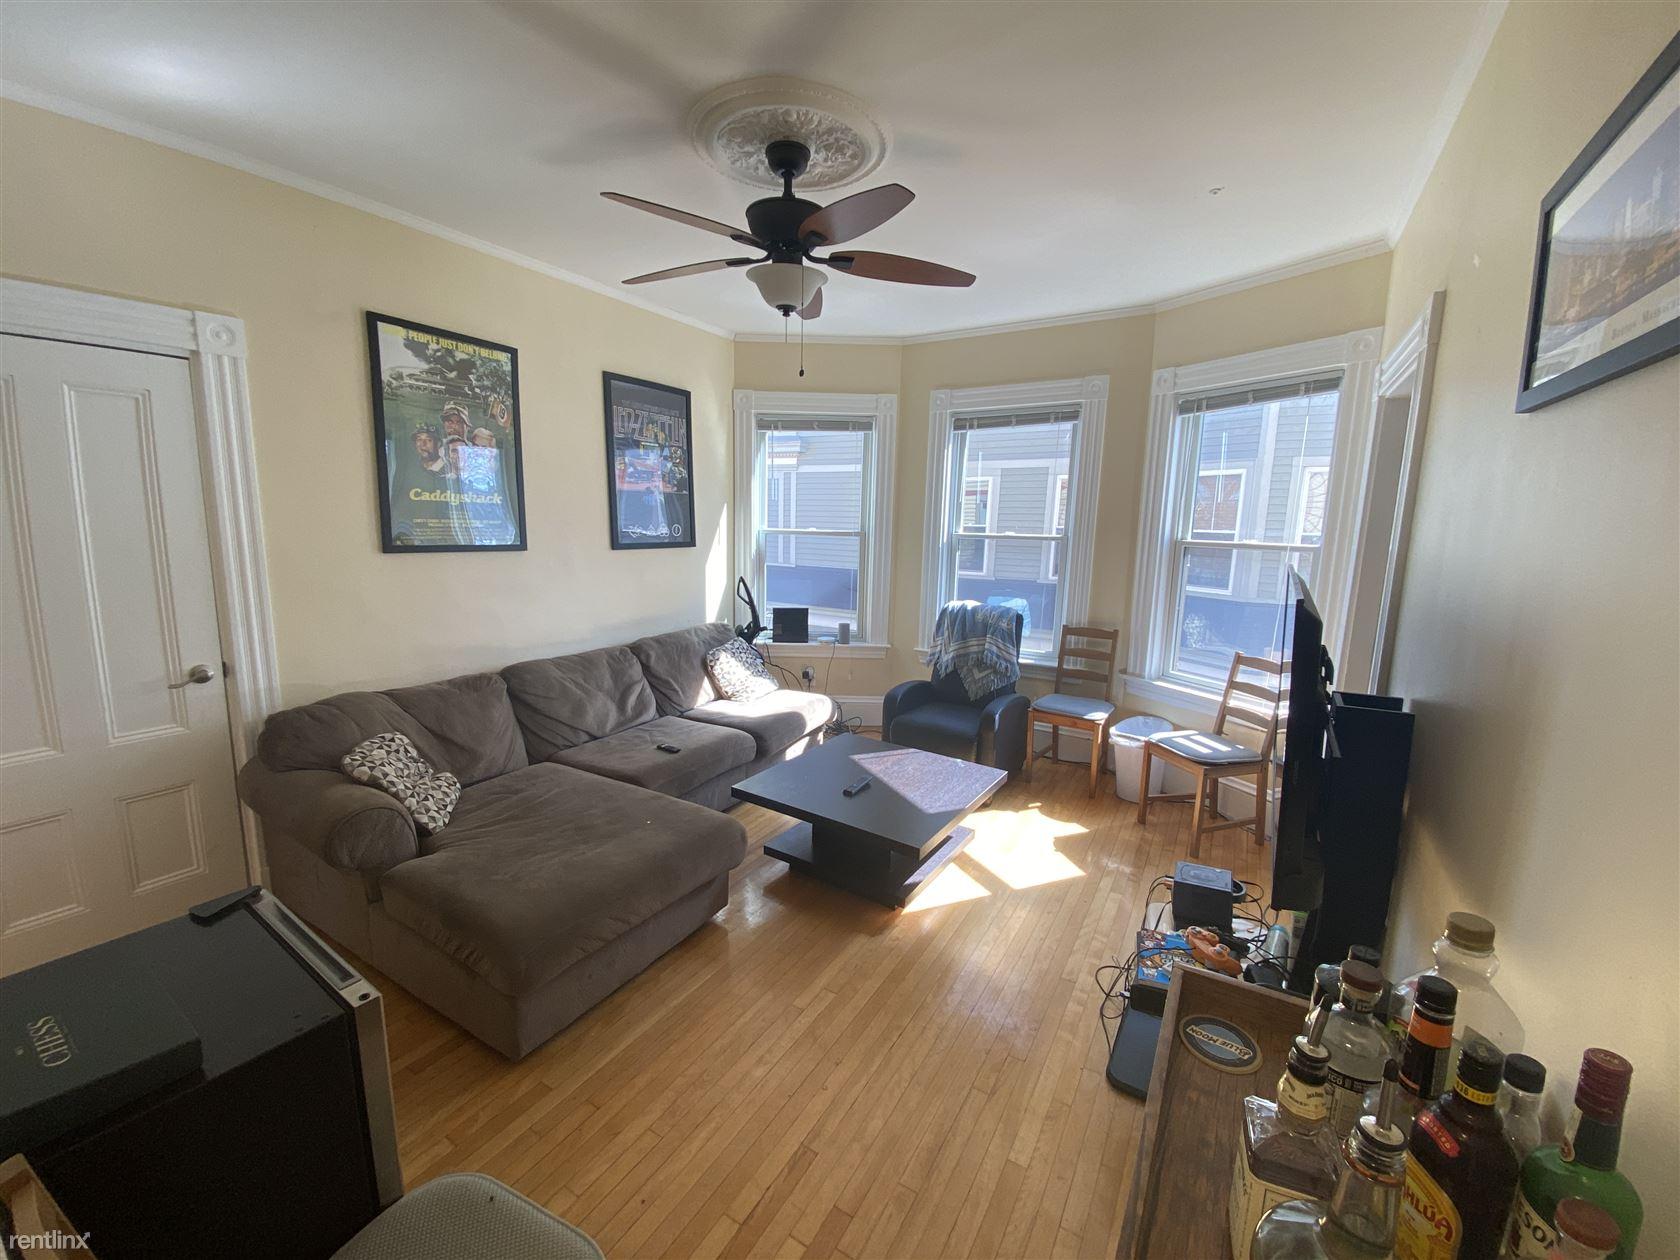 176 Elm St # 2, North Cambridge, MA - $5,000 USD/ month